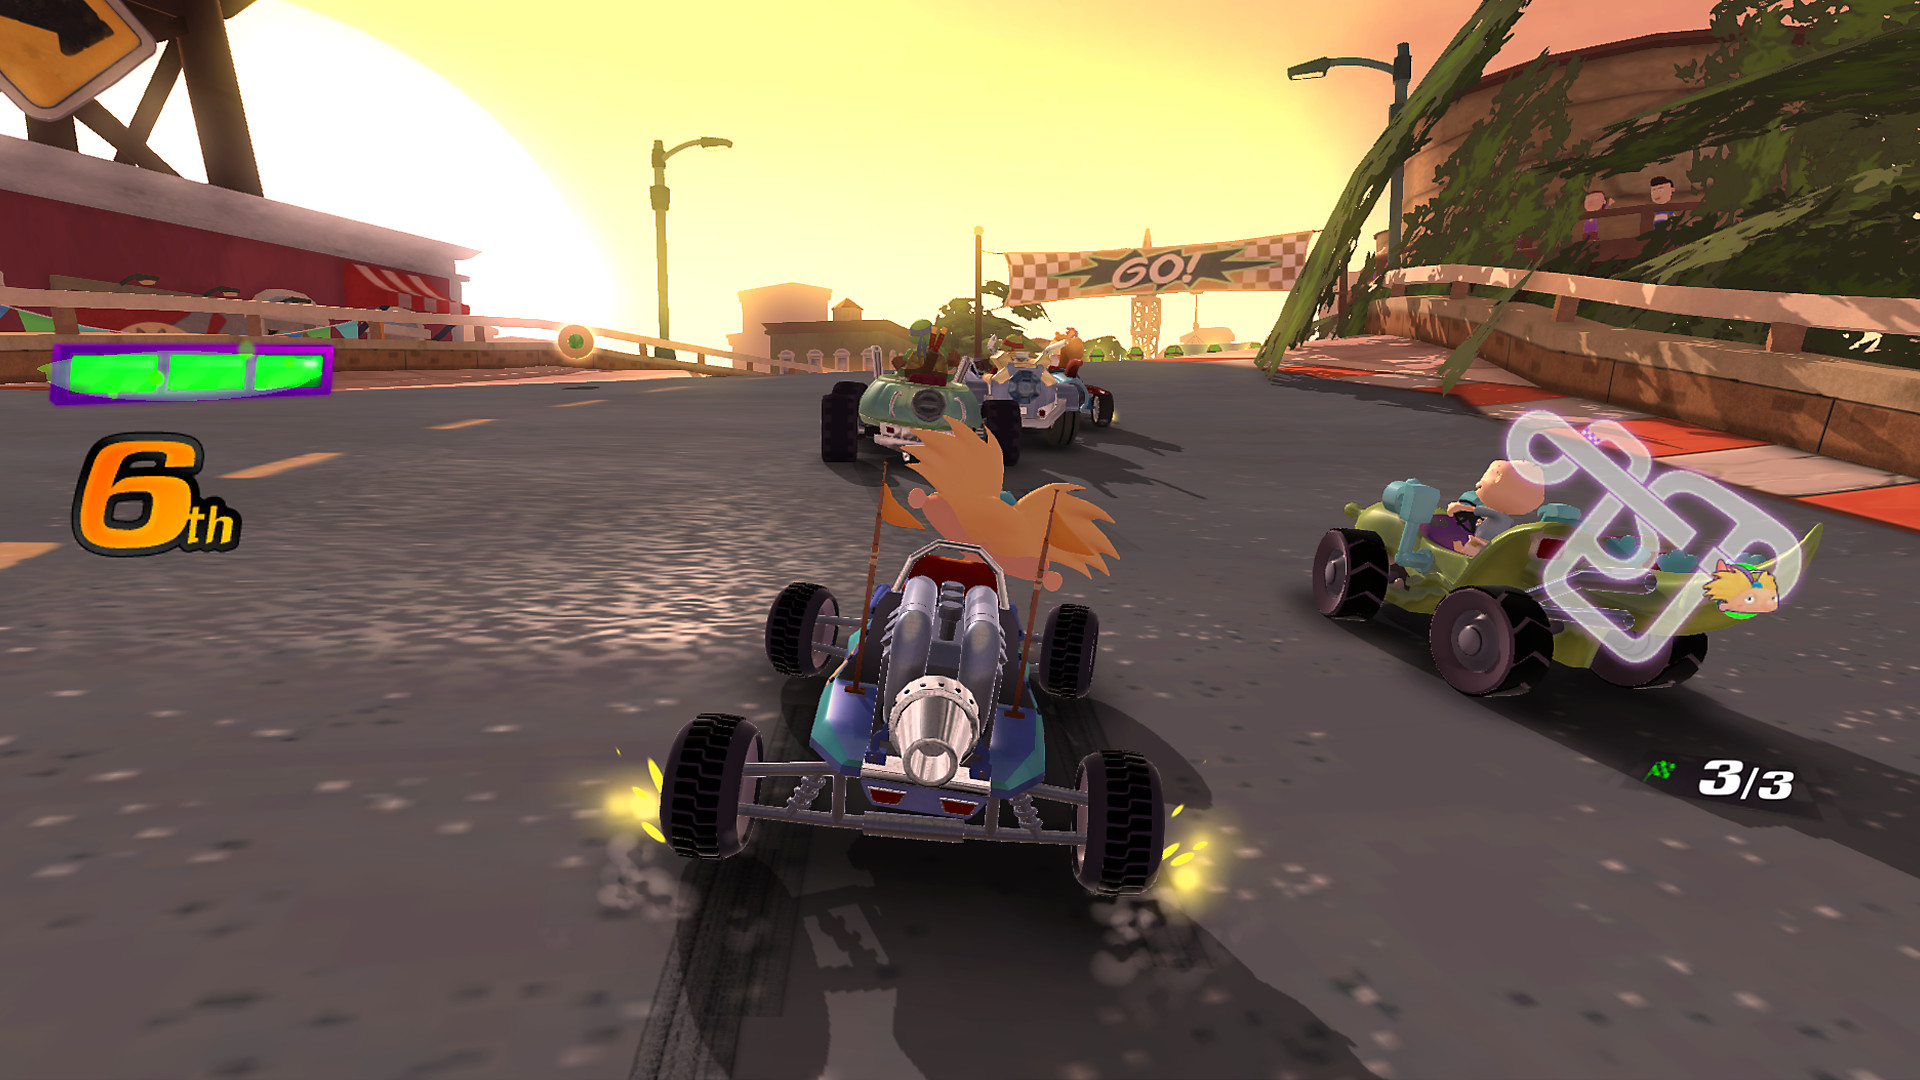 Nickelodeon Kart Racers Game Ps4 Playstation